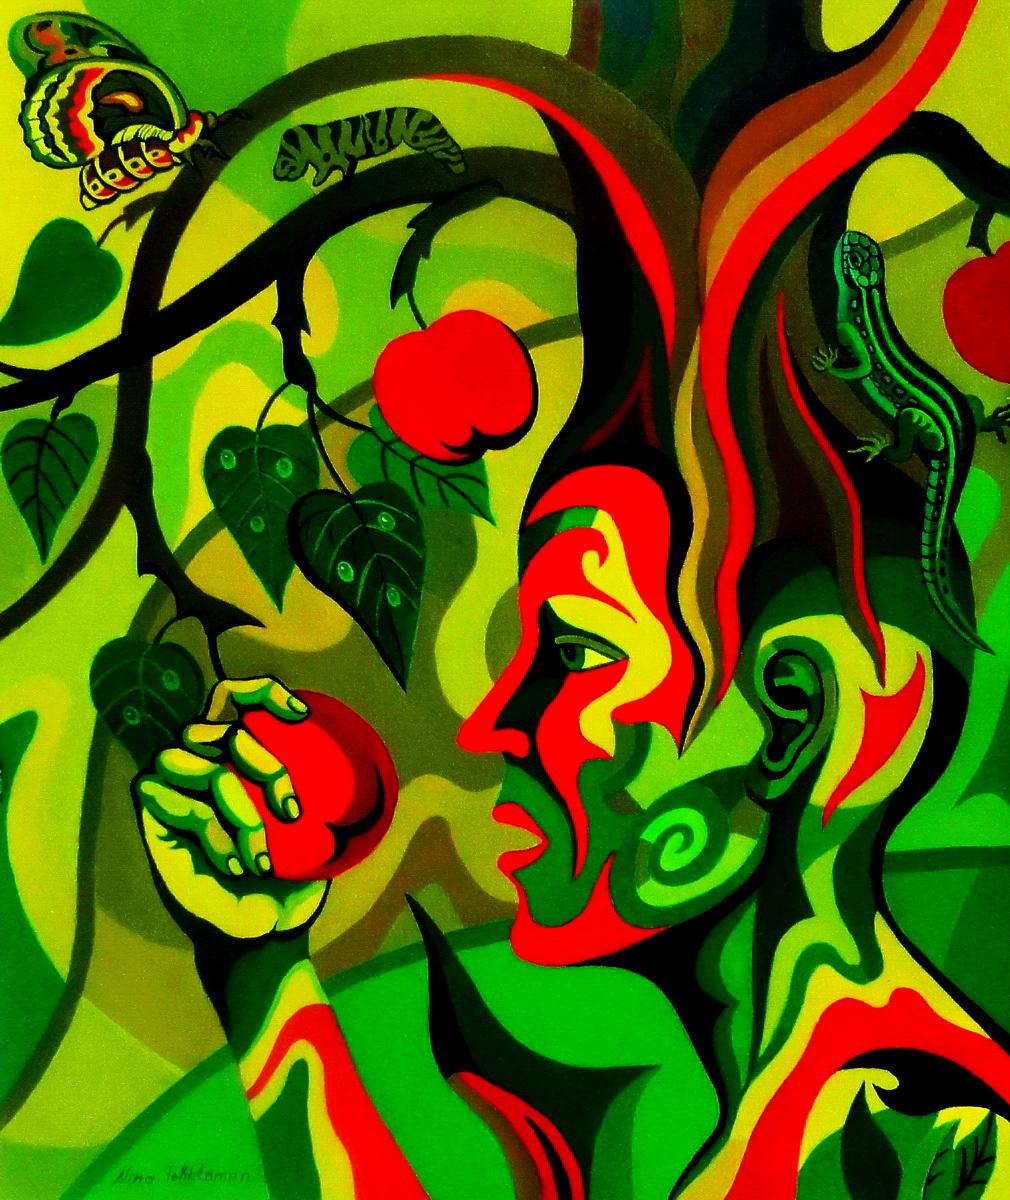 Eve and Tree of Knowledge, dipinto diNina Tokhtaman Valetova